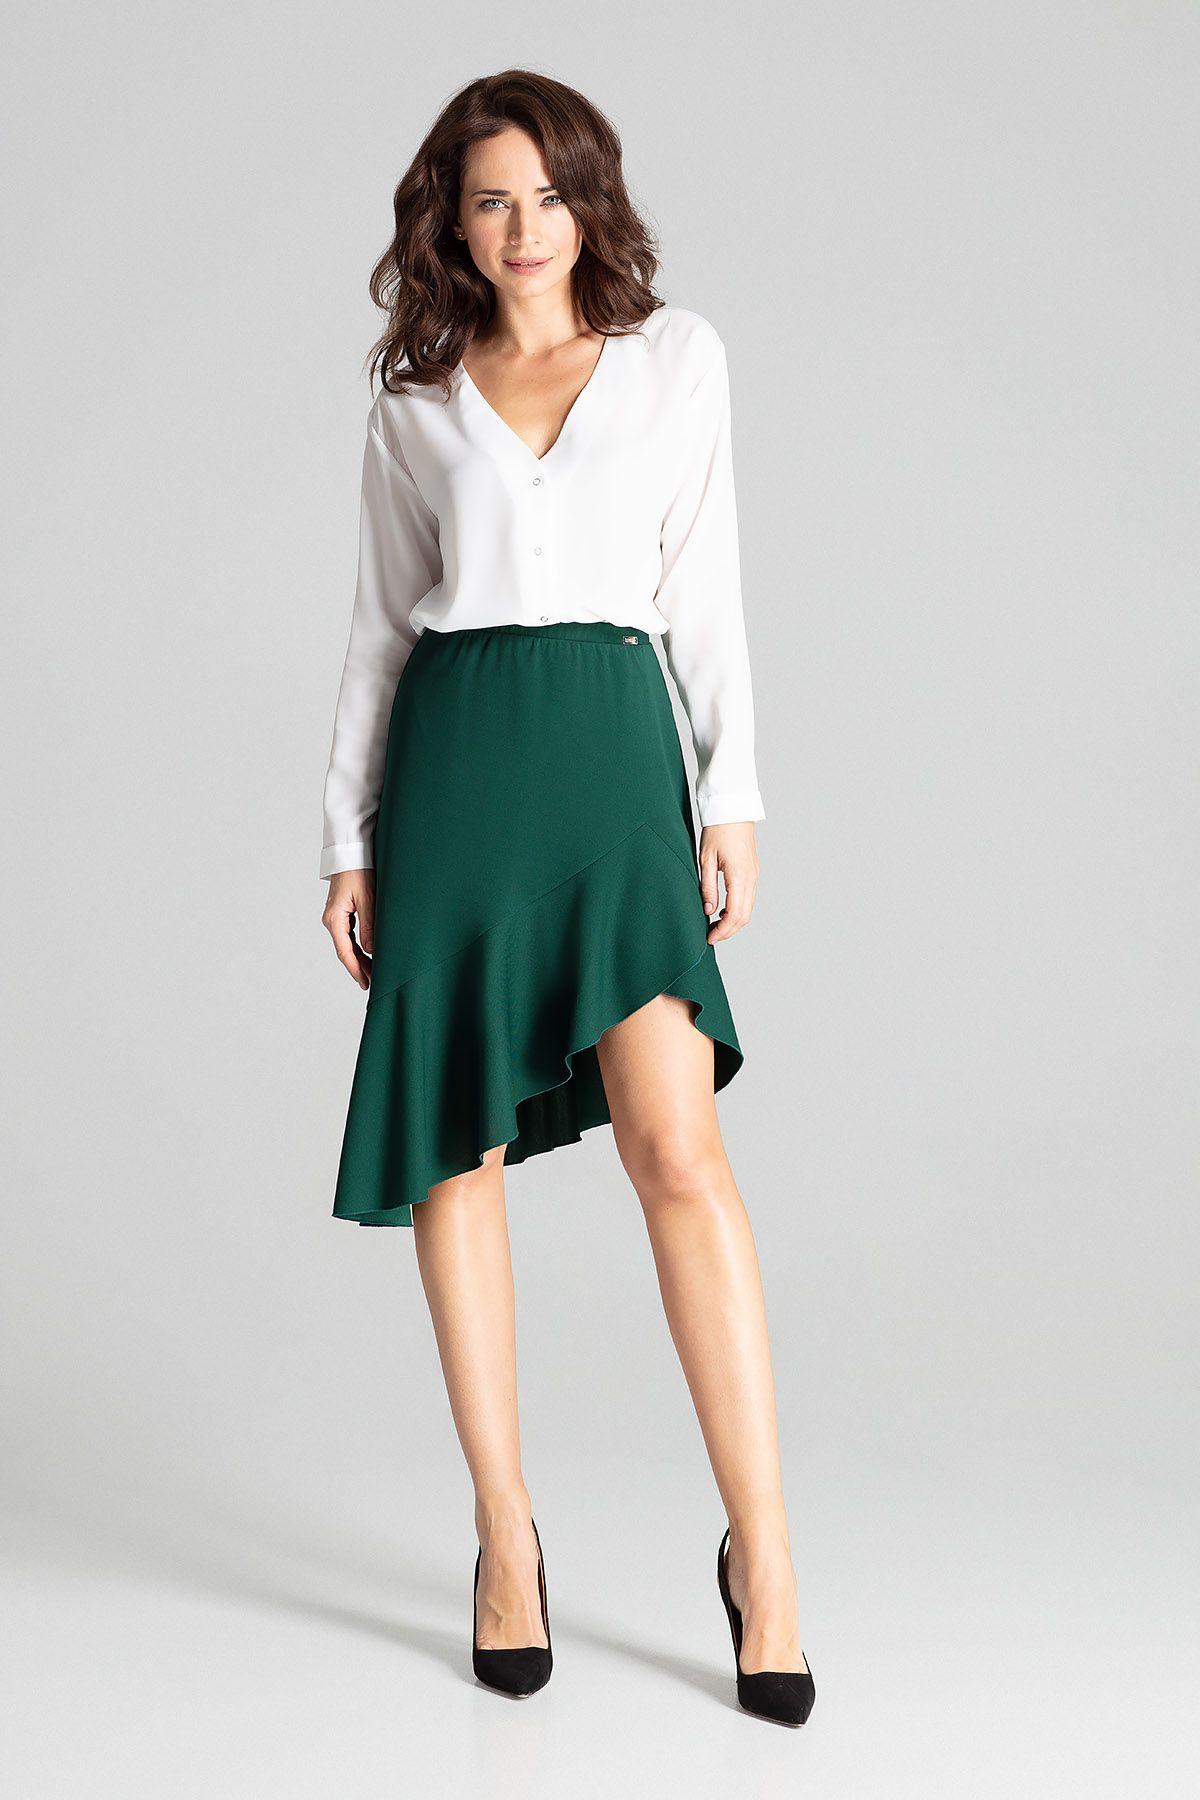 Green Asymmetrical Skirt With Frill